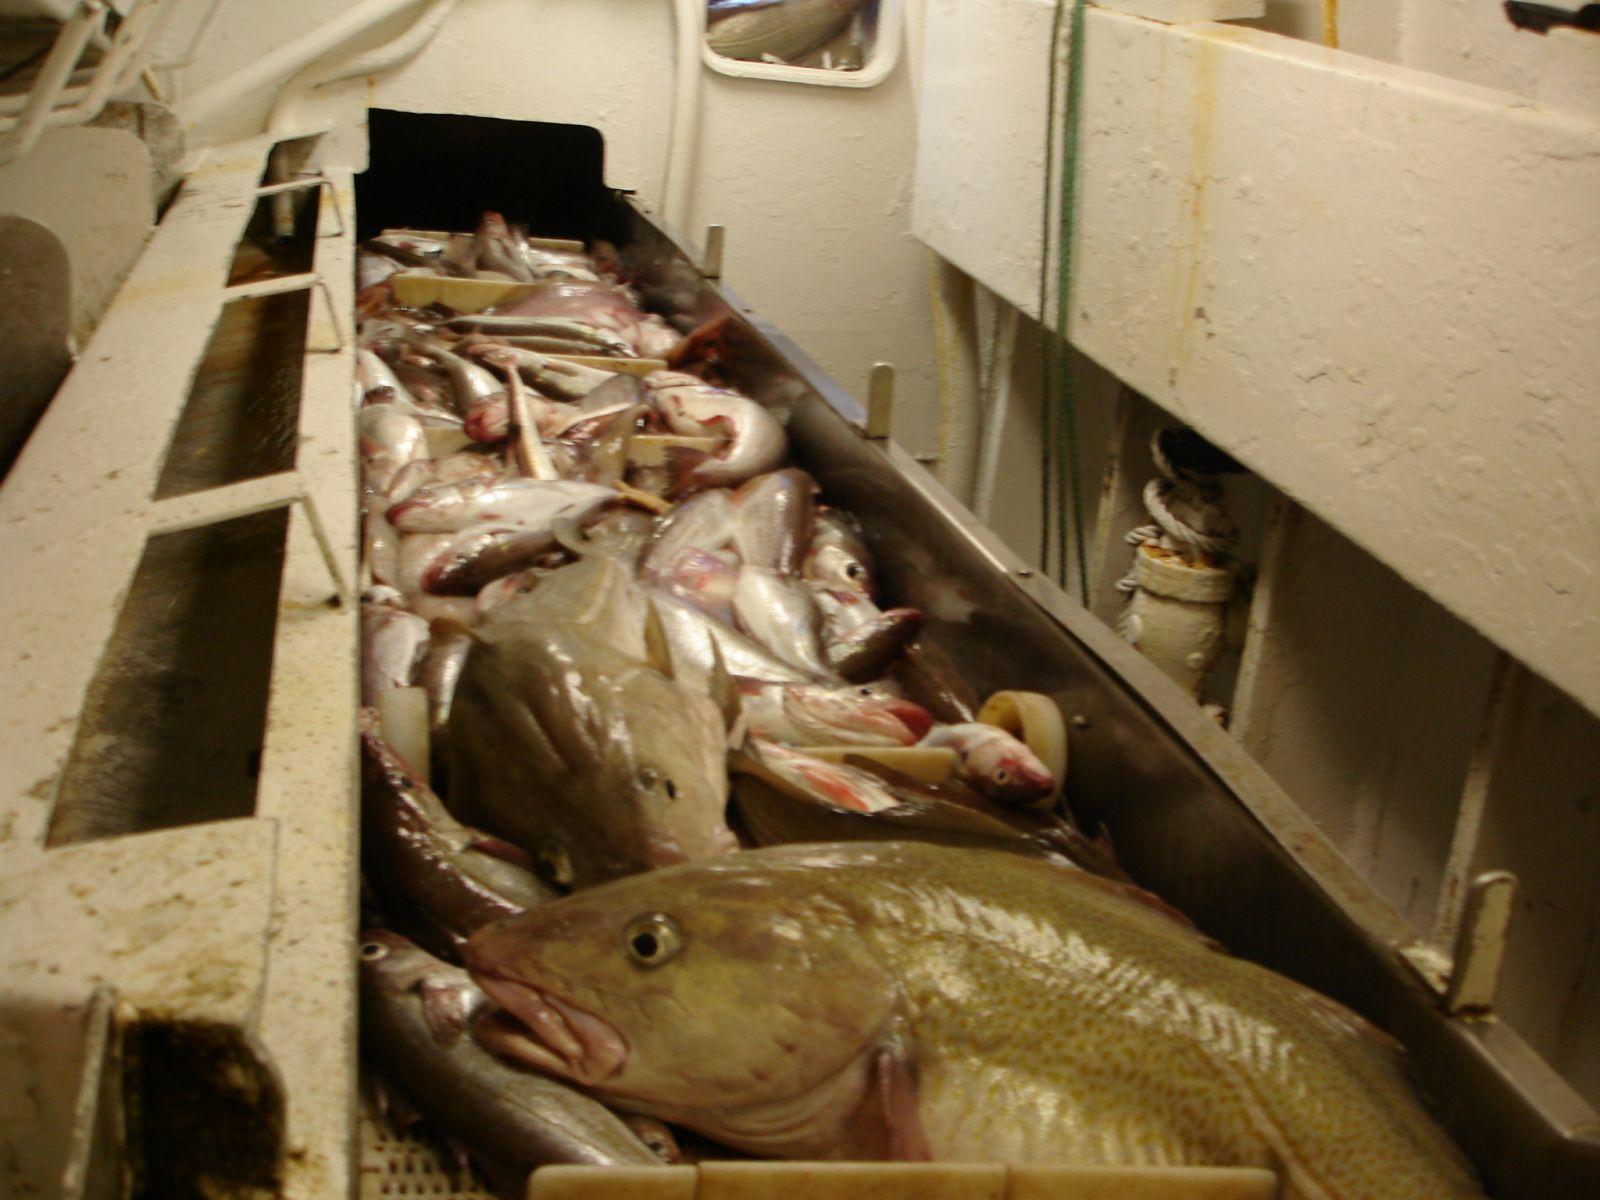 New Year Trip- Belt of fish